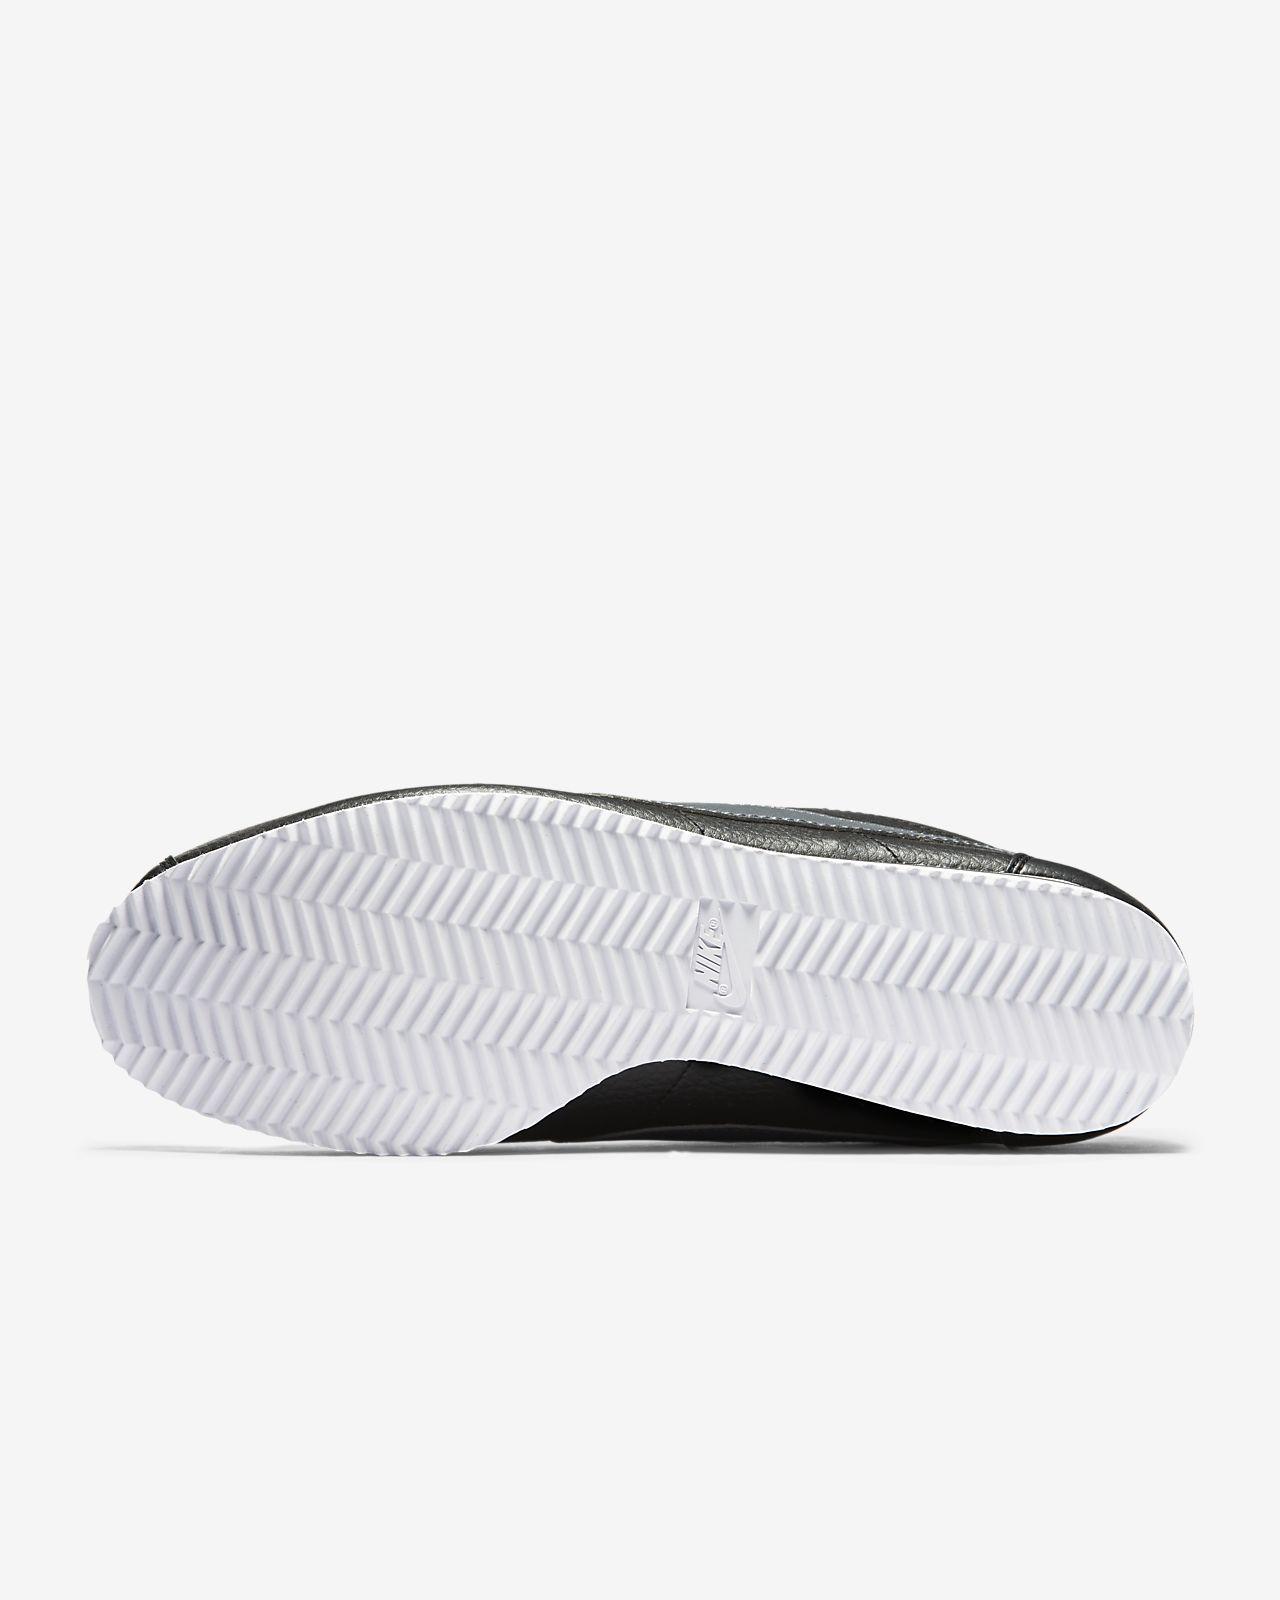 detailed look 636df 10499 ... Nike Classic Cortez Men s Shoe